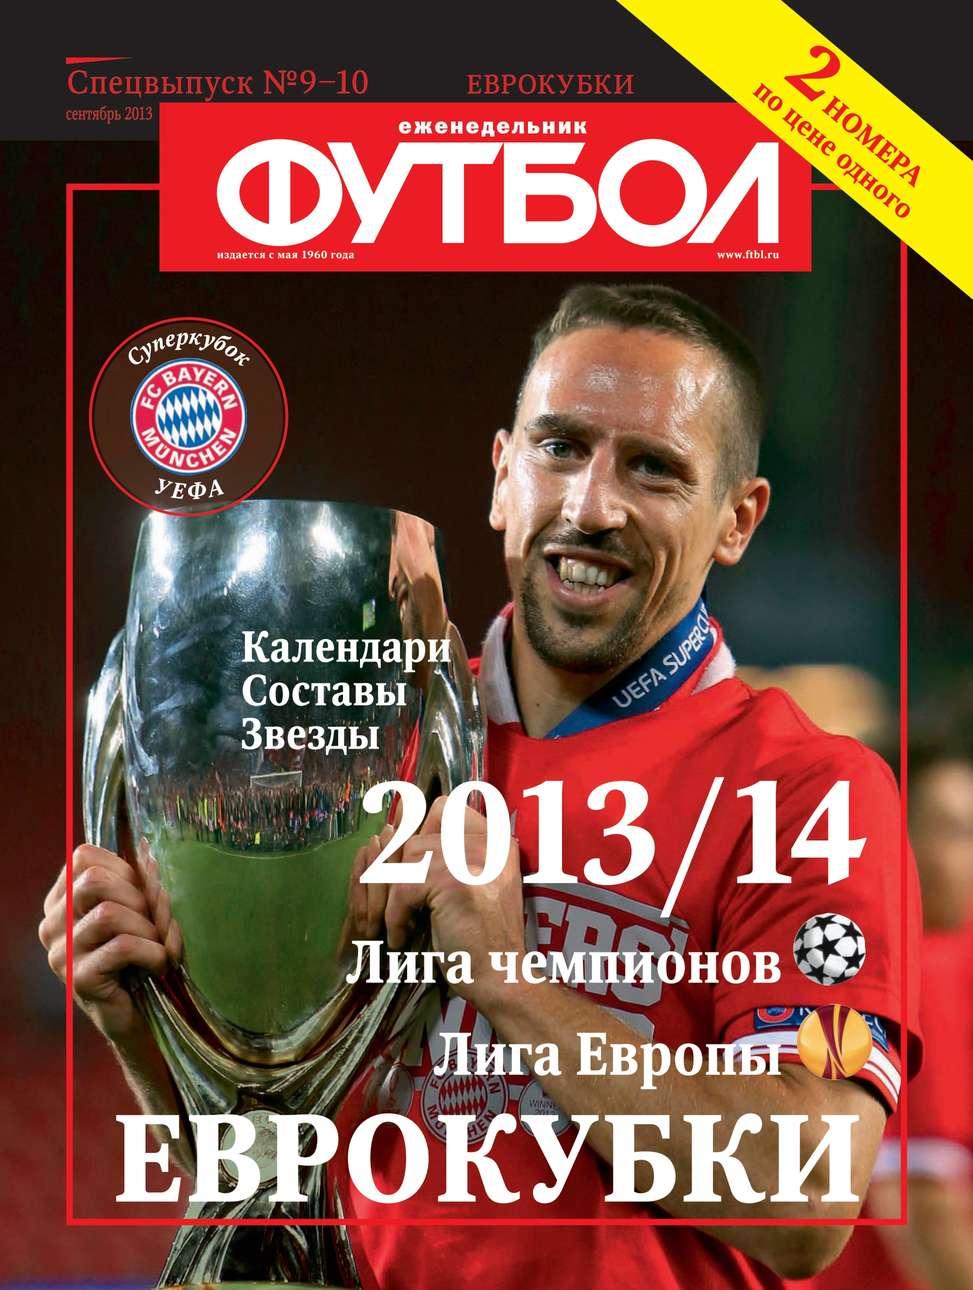 Редакция журнала Футбол Спецвыпуск Футбол Спецвыпуск 09-10-2013 футбол